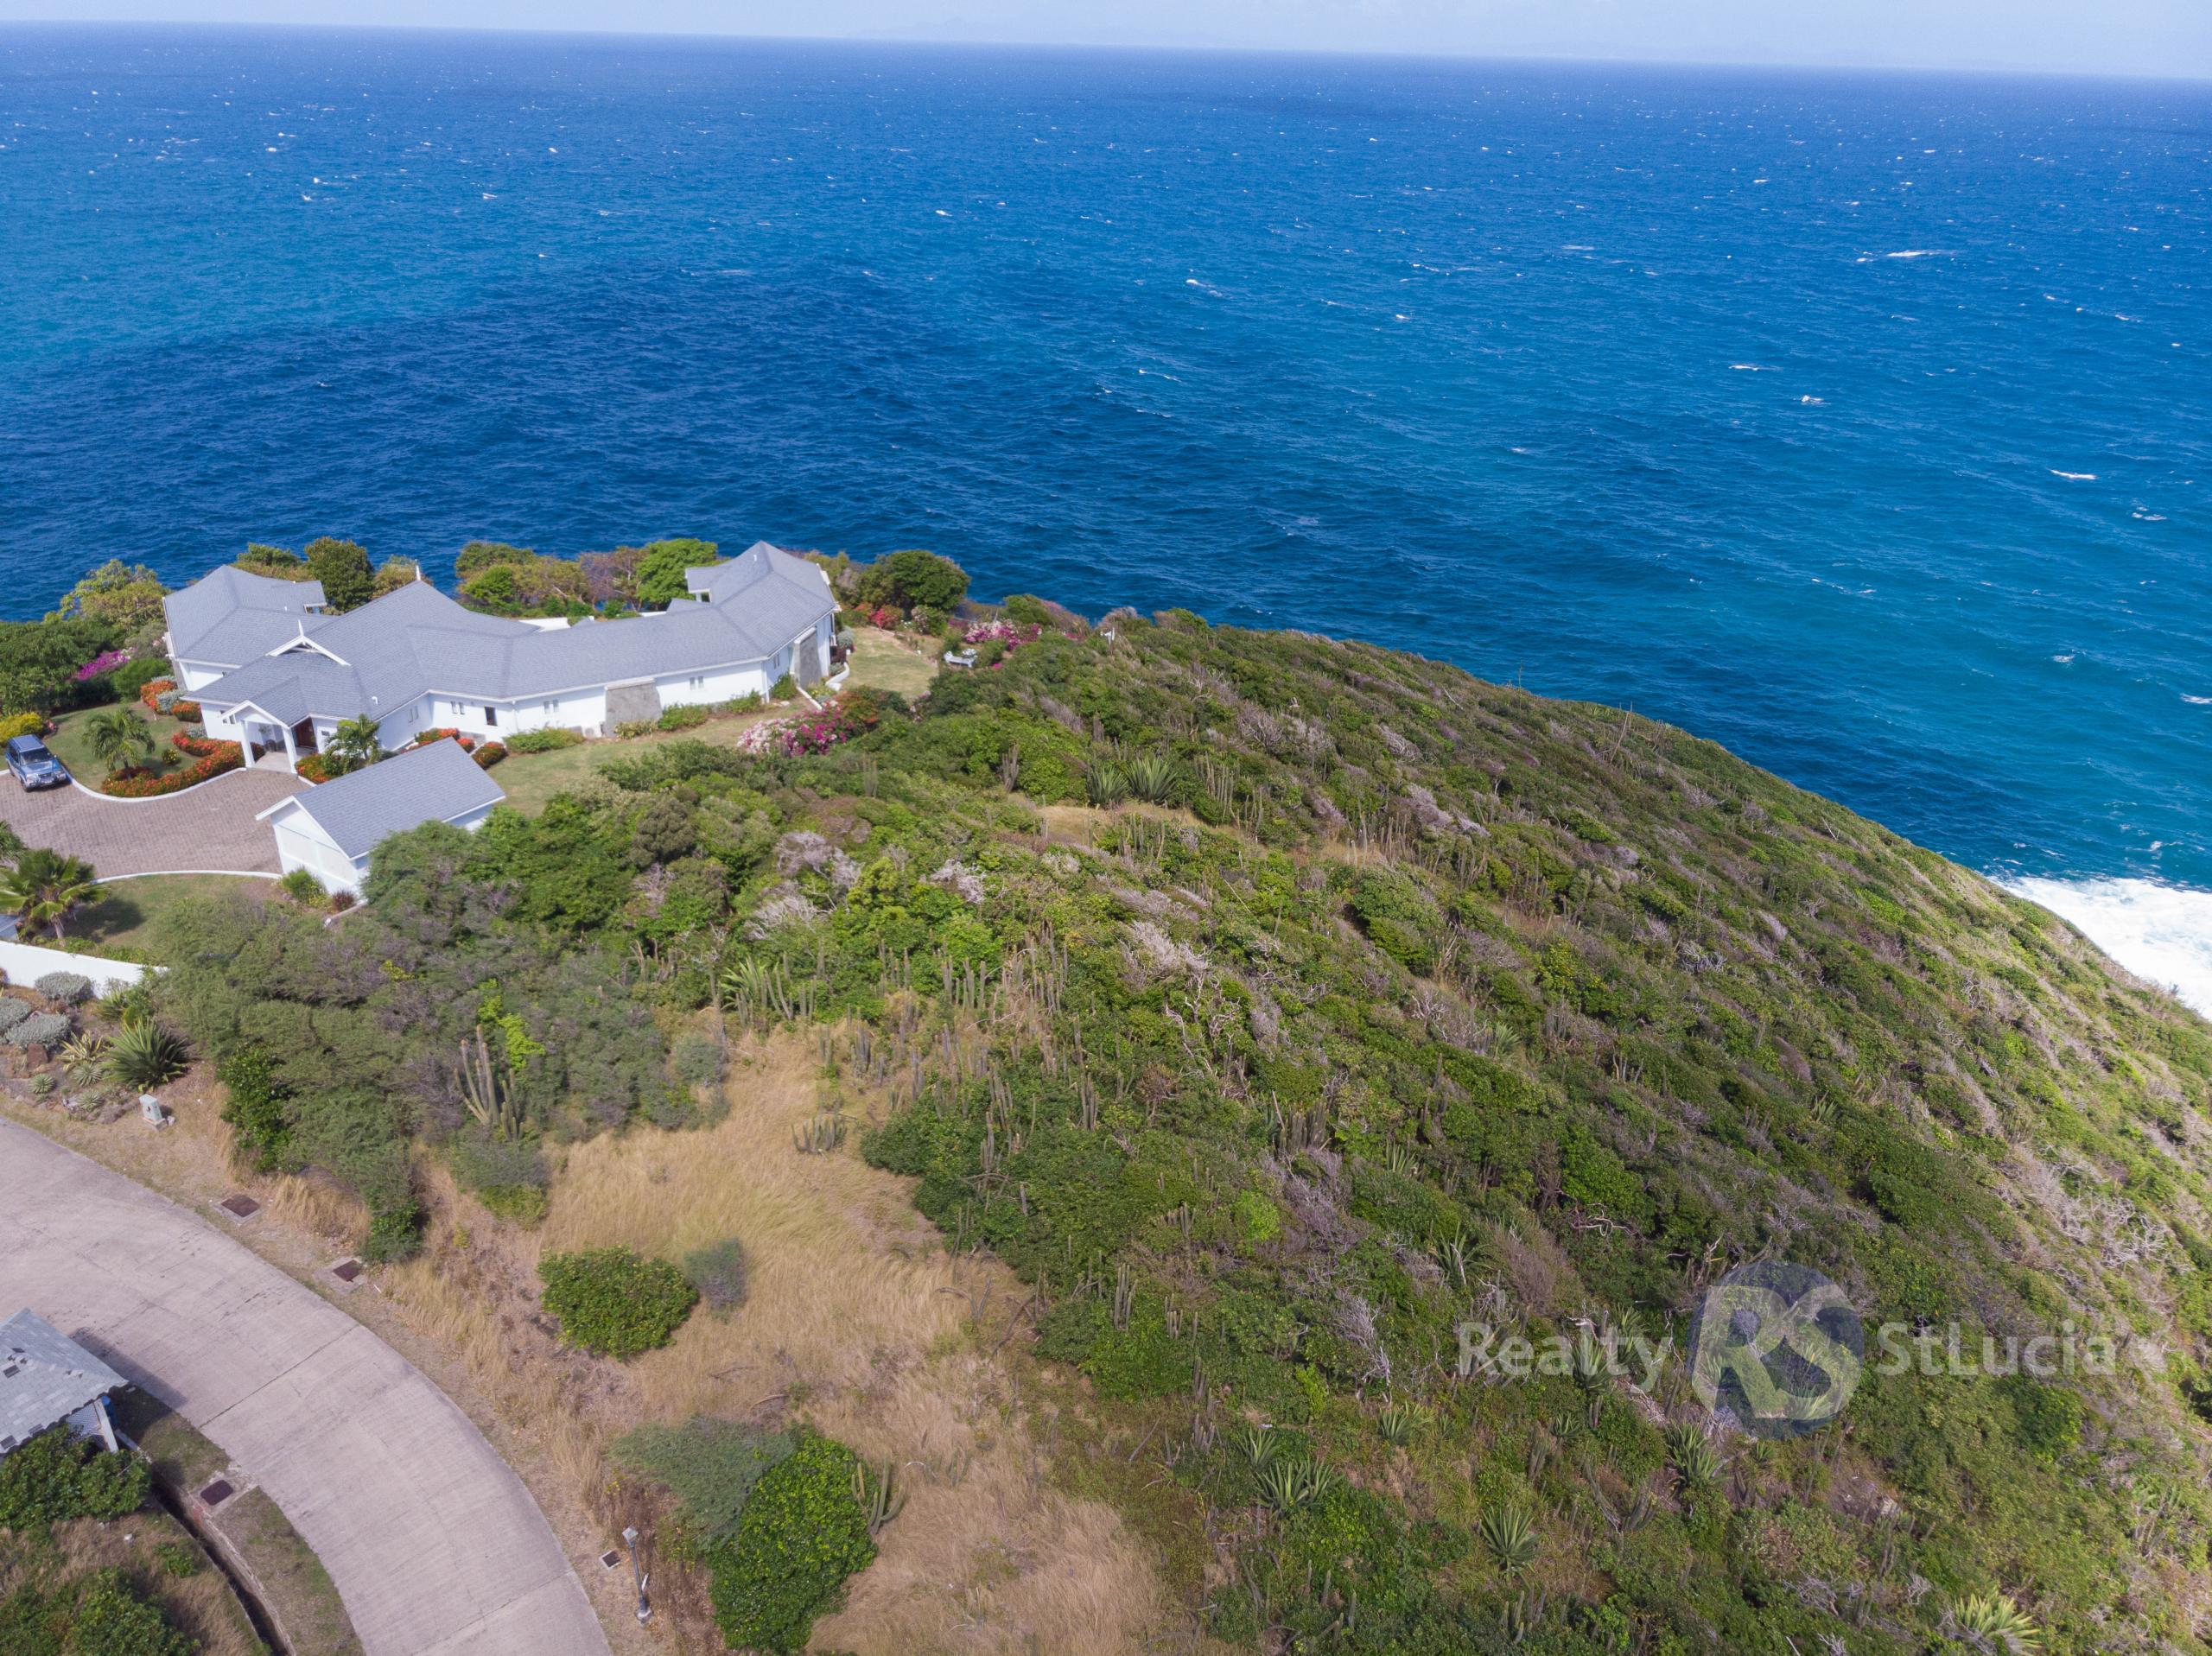 sea breeze hills cap estate land for sale St Lucia